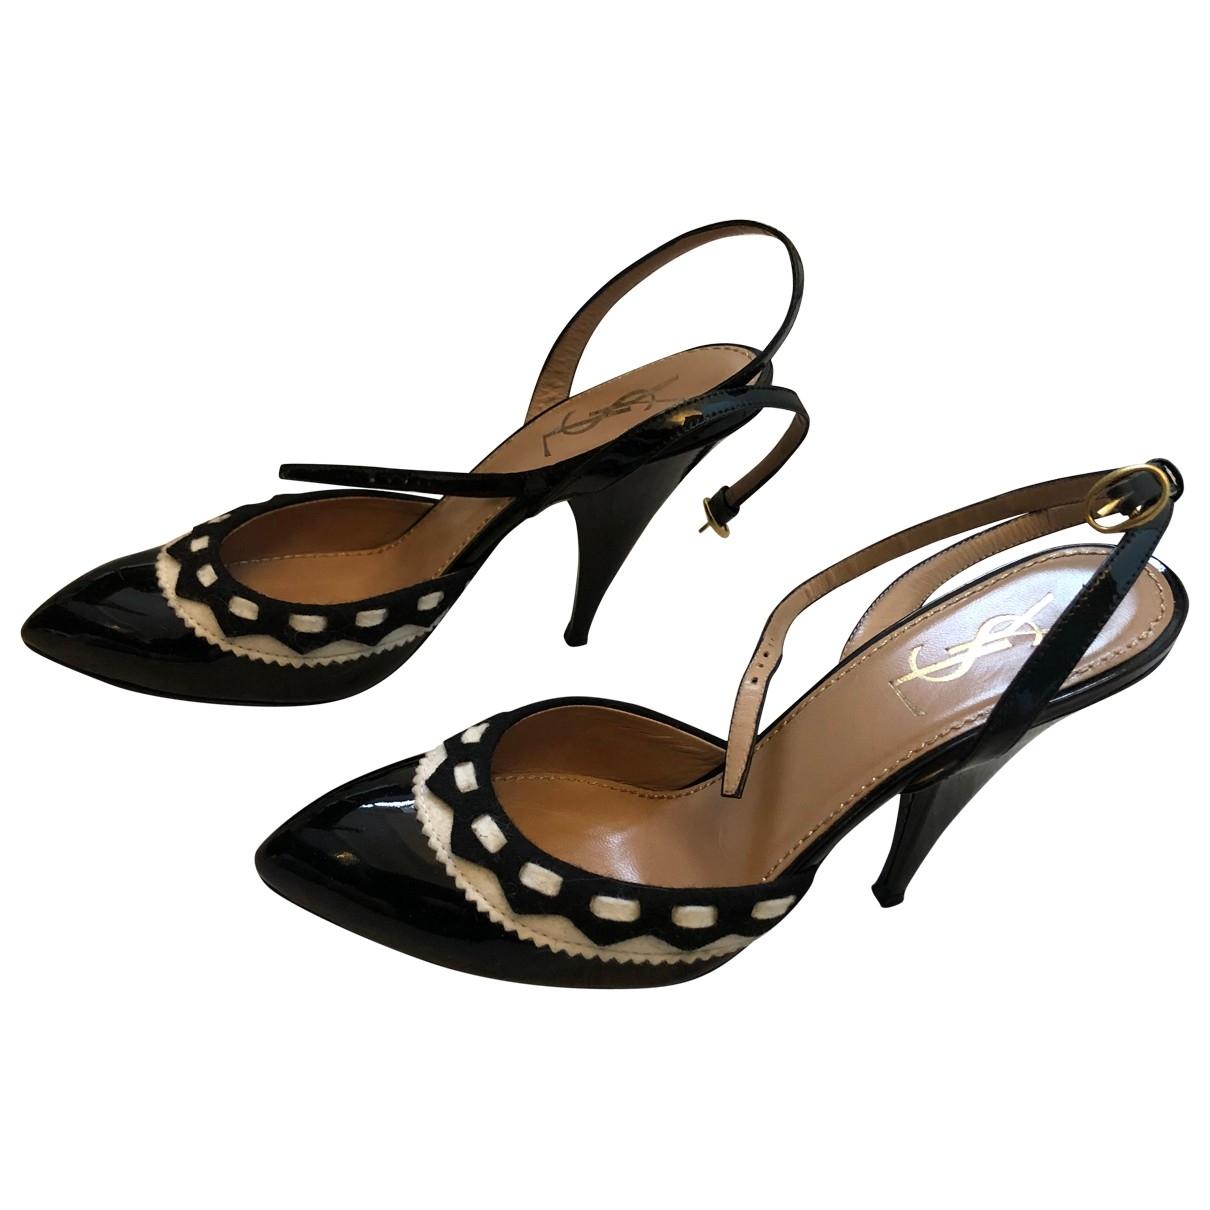 Yves Saint Laurent \N Black Patent leather Heels for Women 37 EU